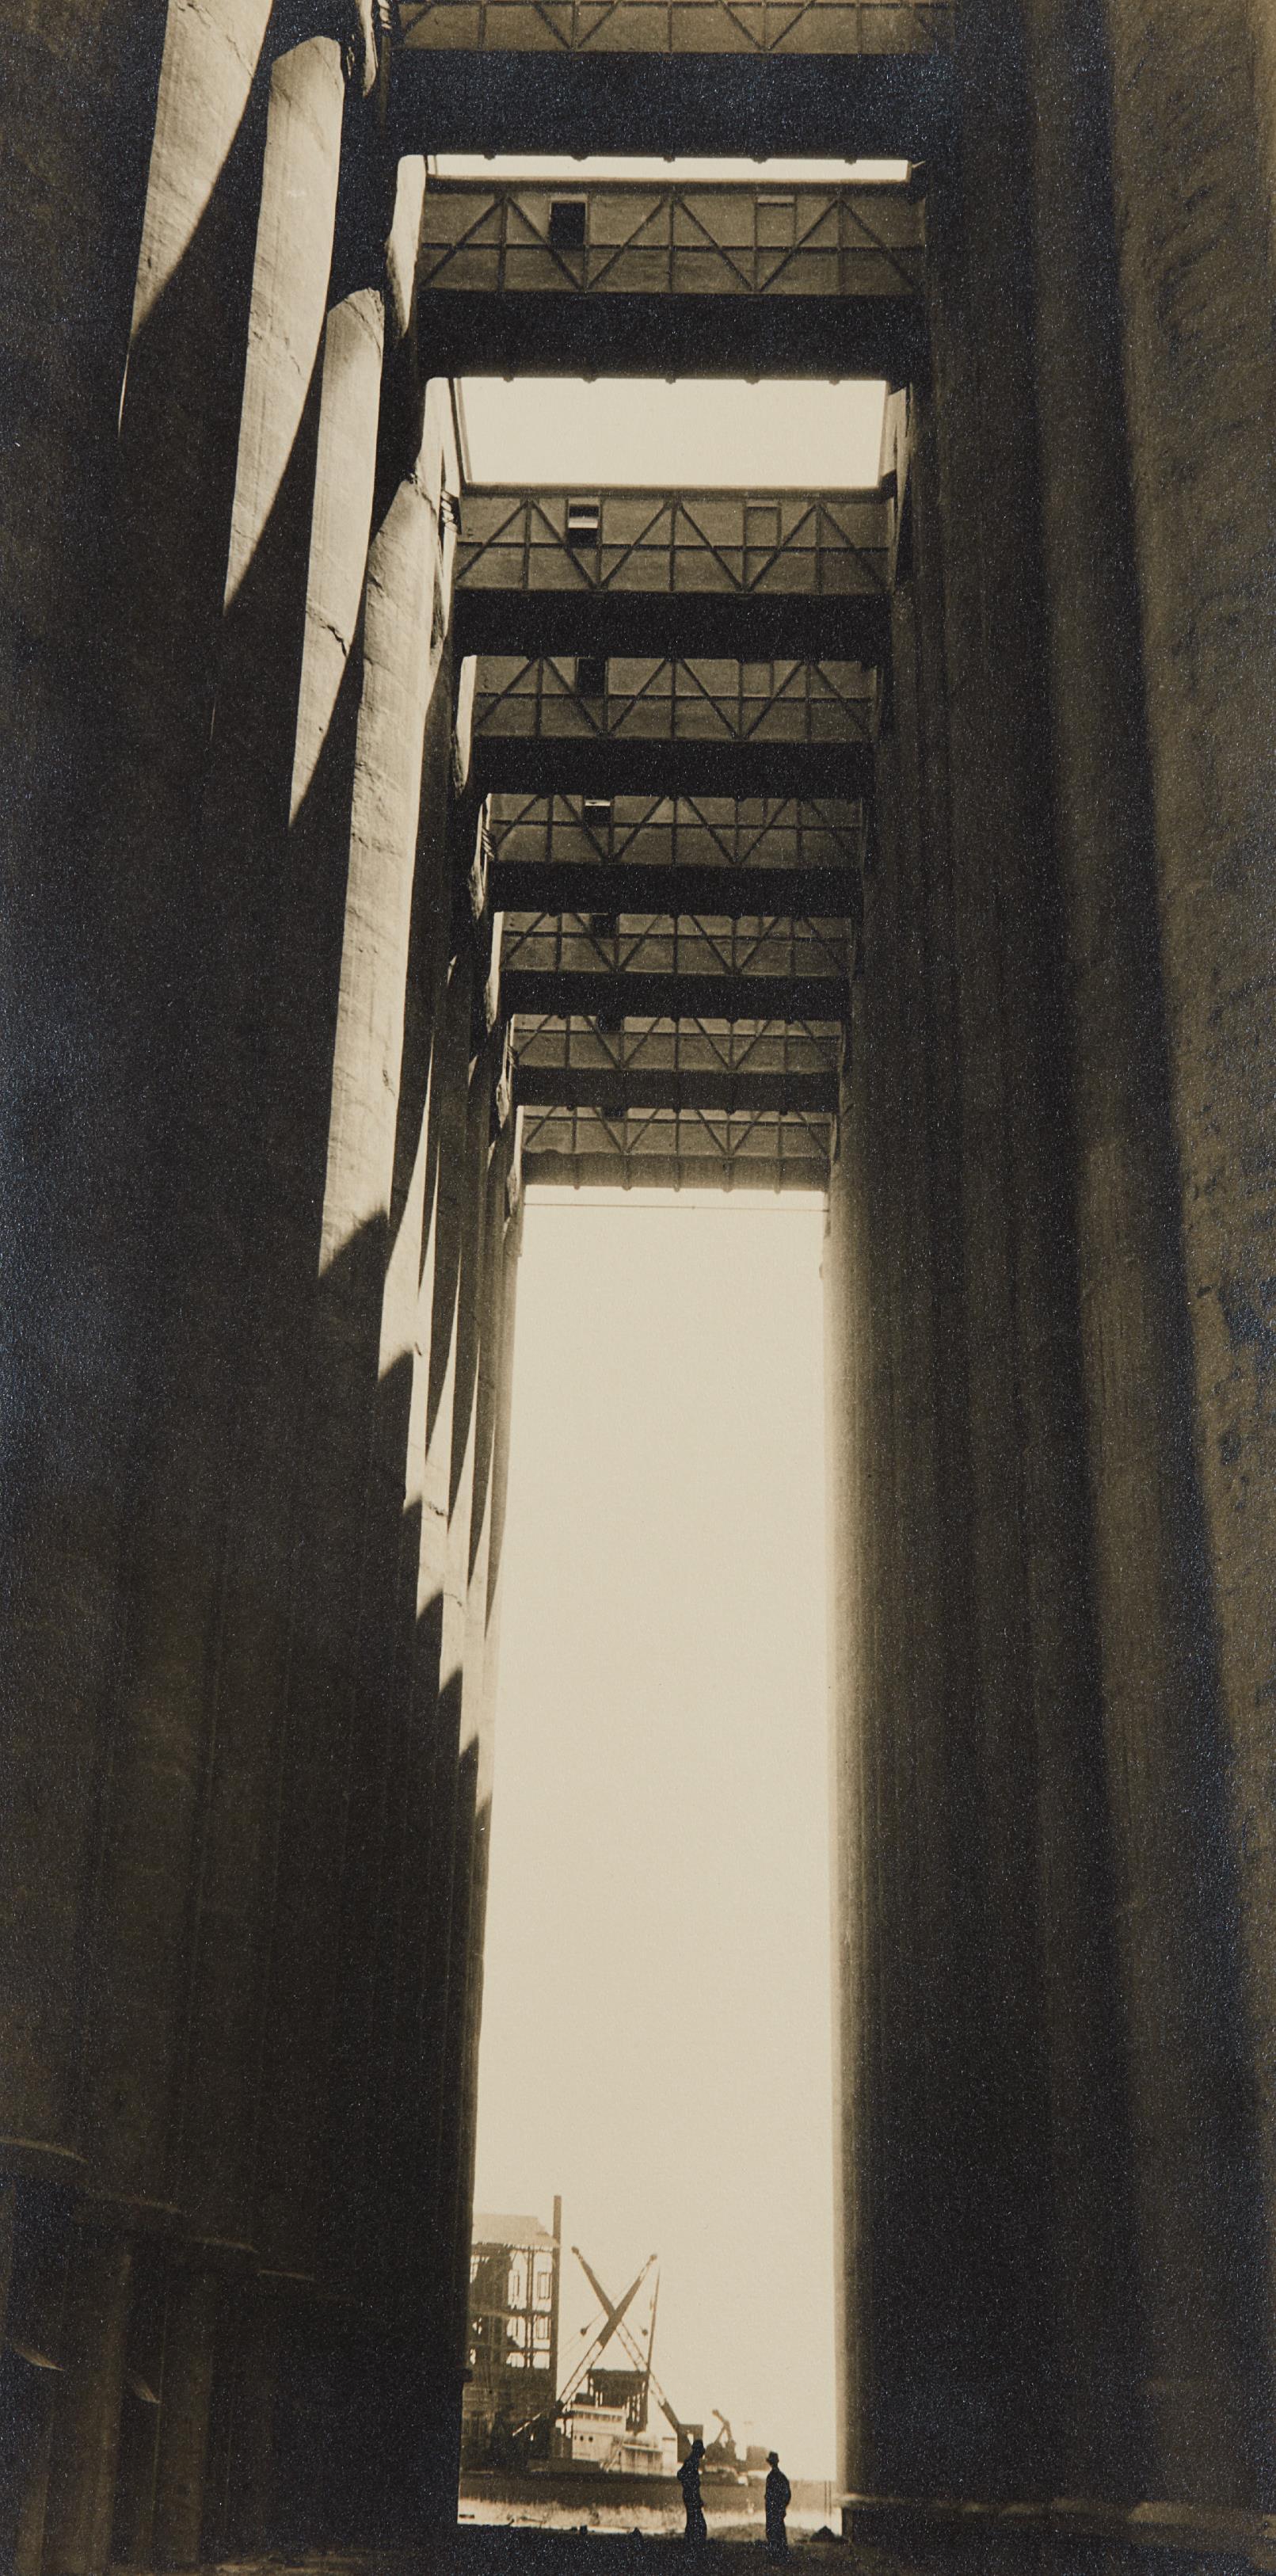 Margaret Bourke-White-Rosenbaum Grain Elevators, Chicago, IL. (Our 'temple view')-1935